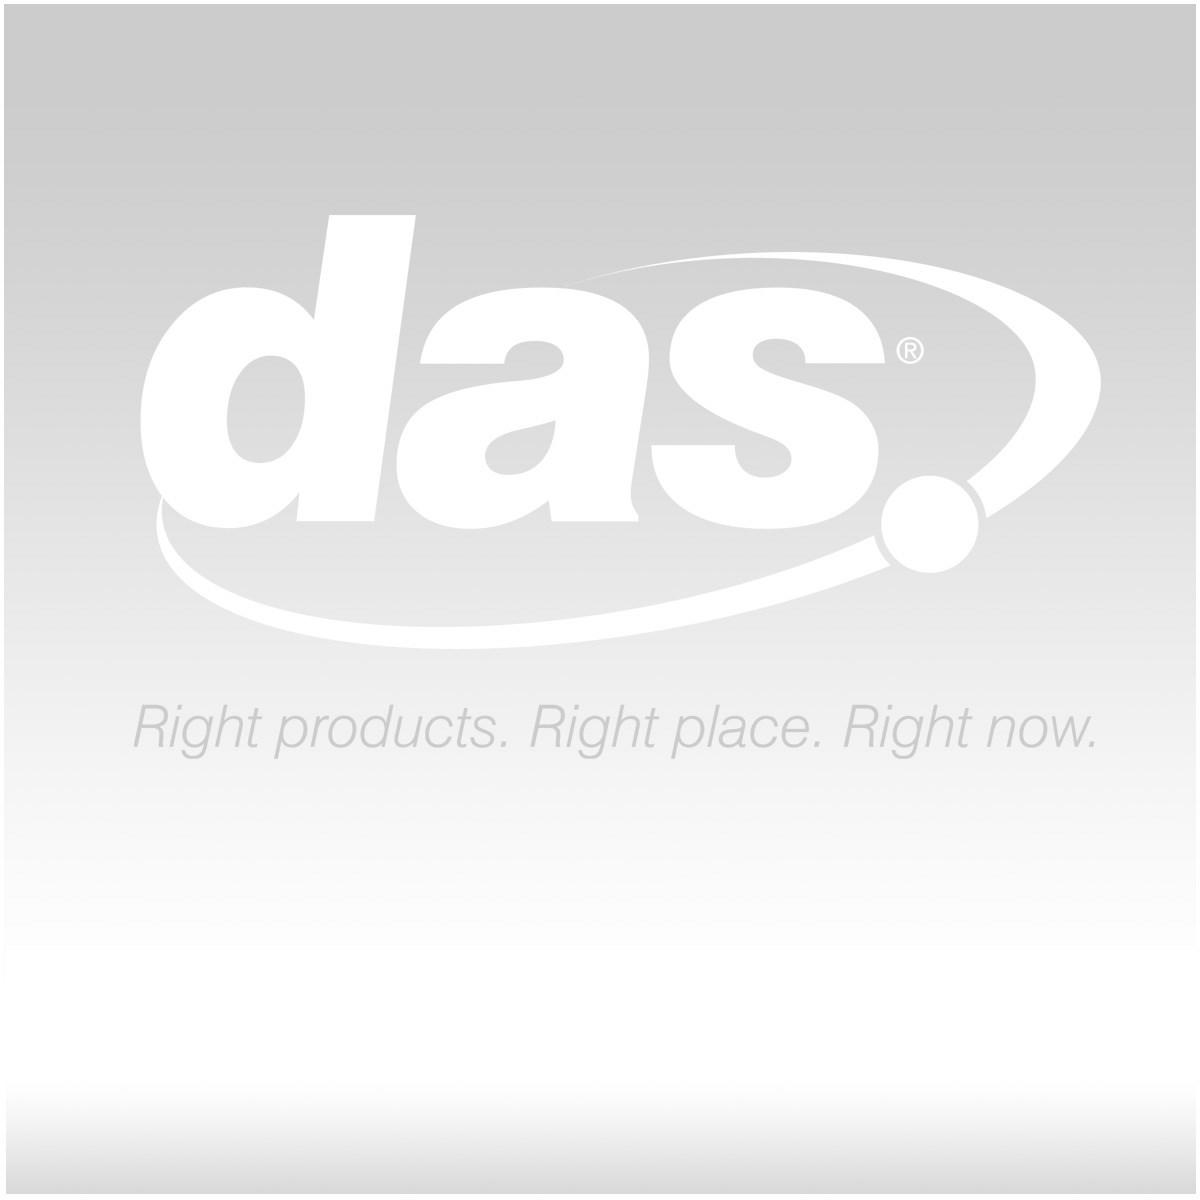 http://www.dasinc.com/images/cea-logo.png